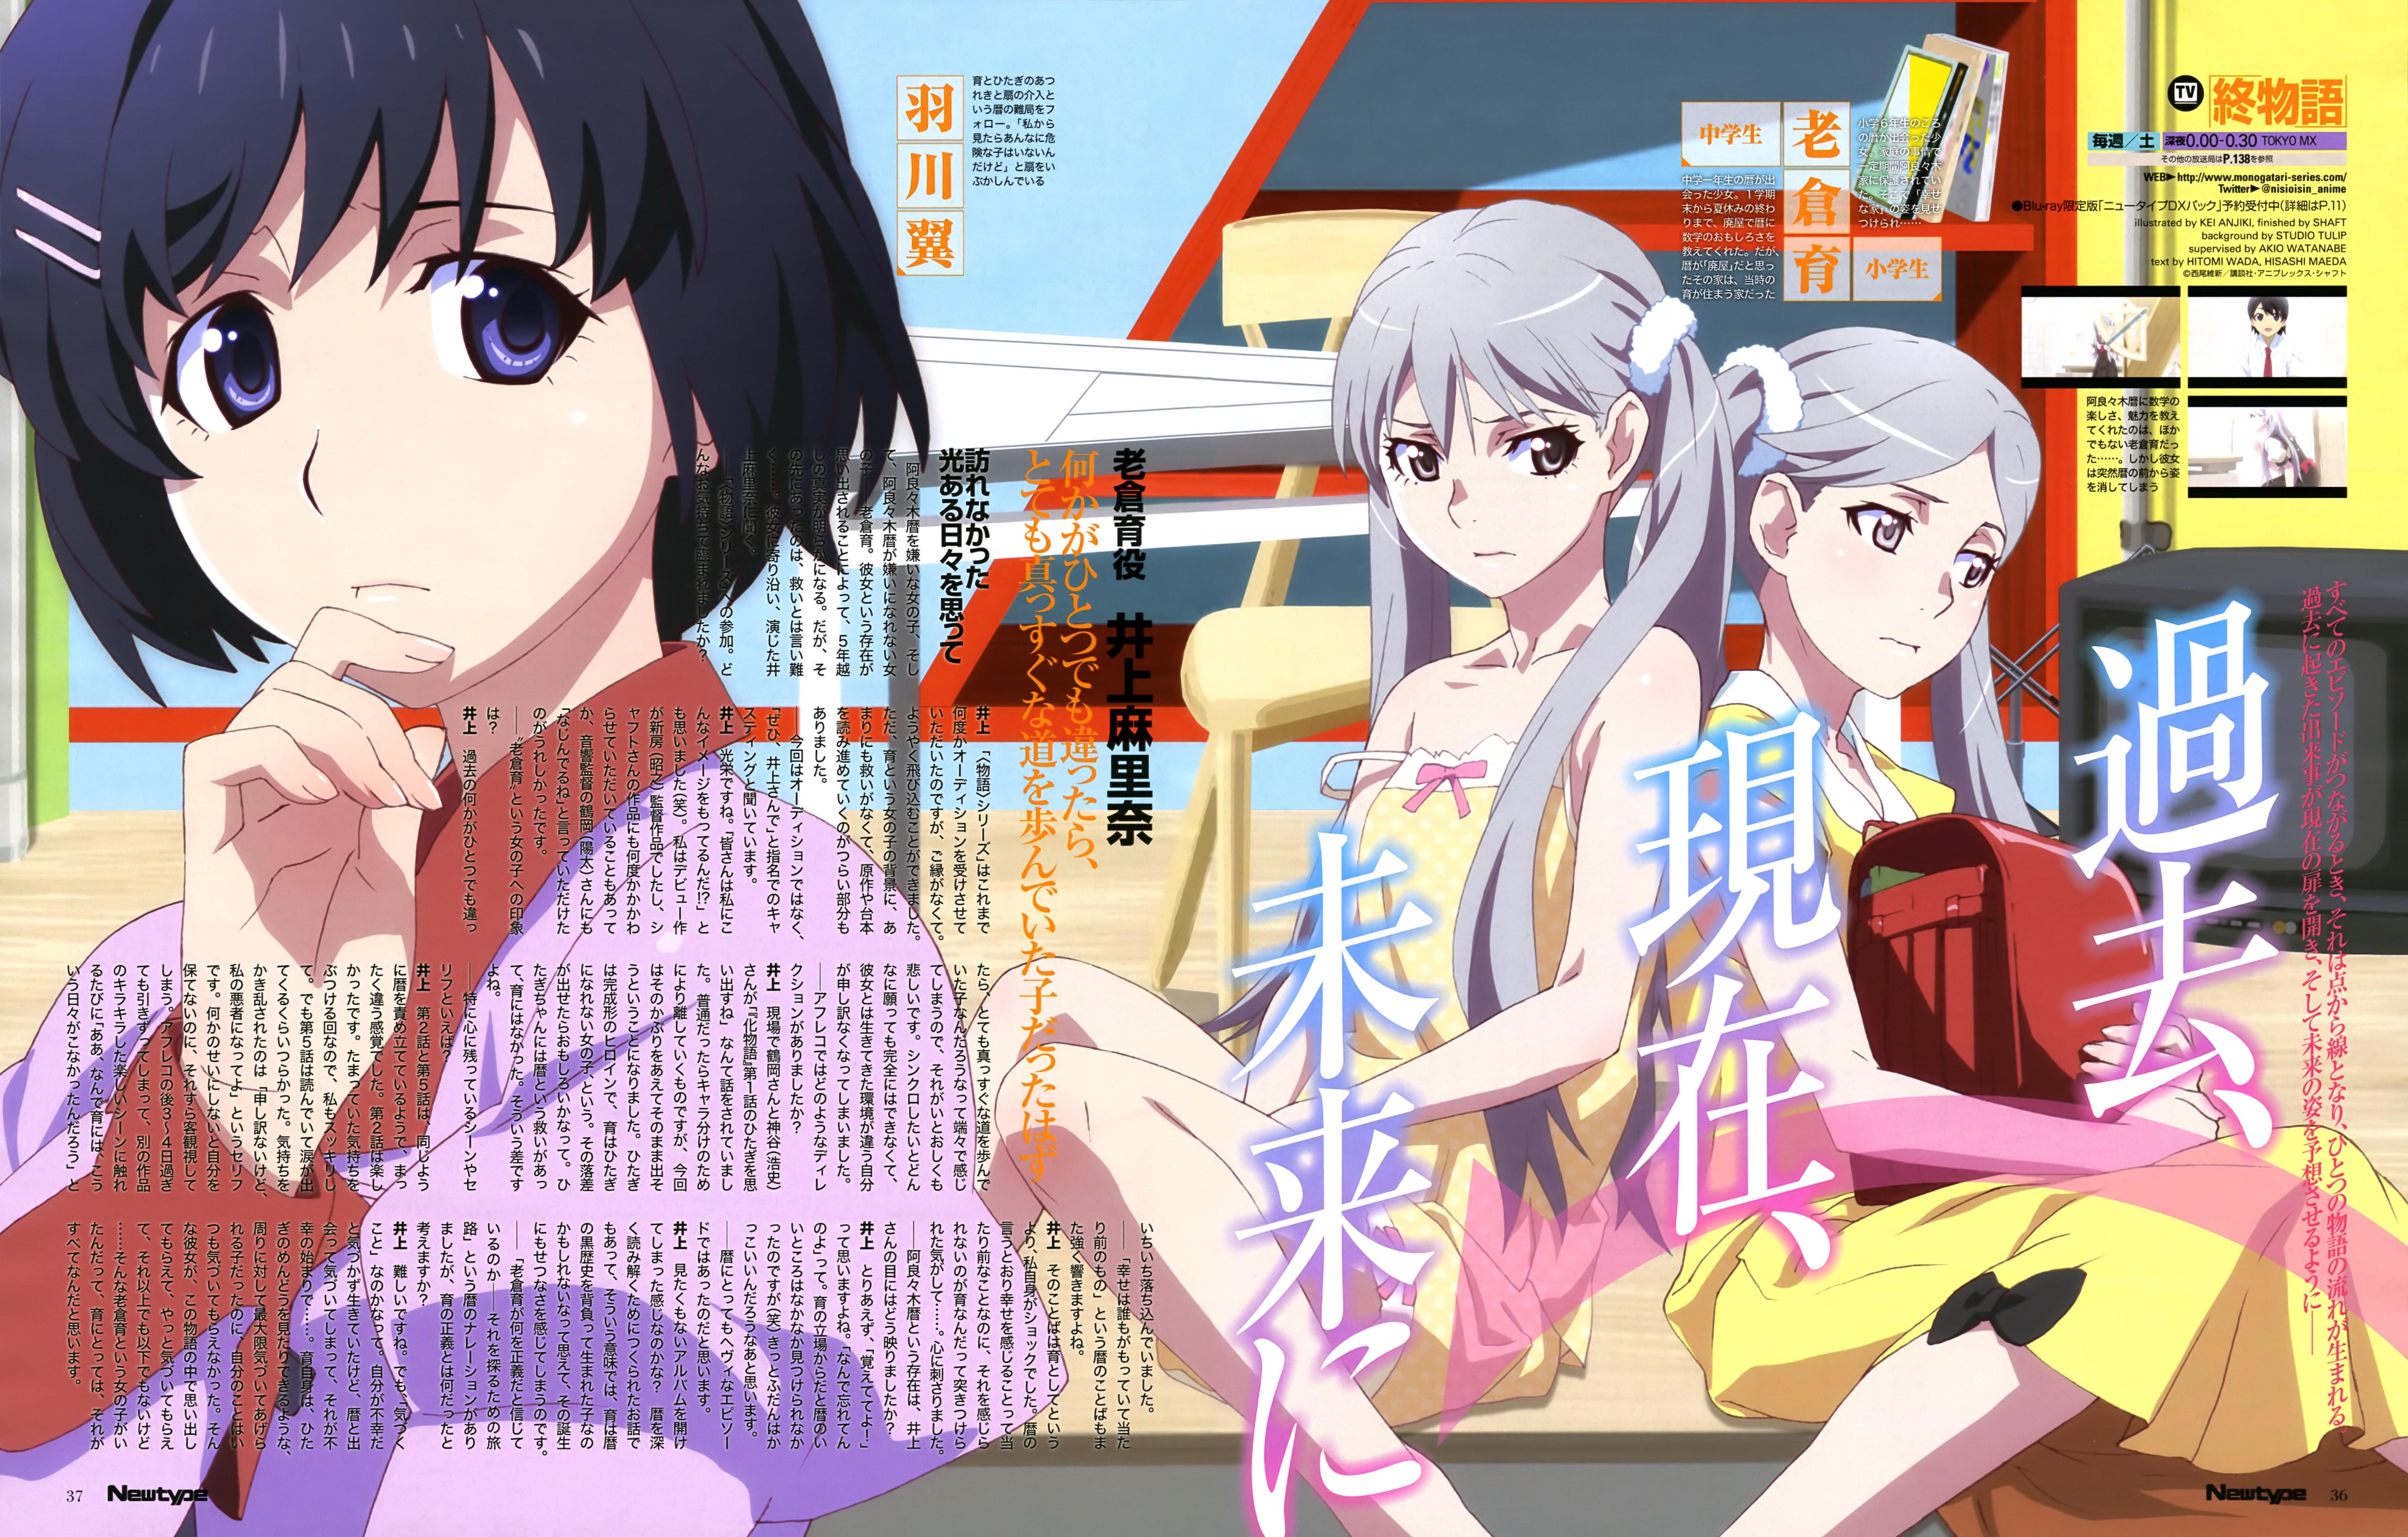 Owarimonogatari anime double page spready newtype december 2015 issue